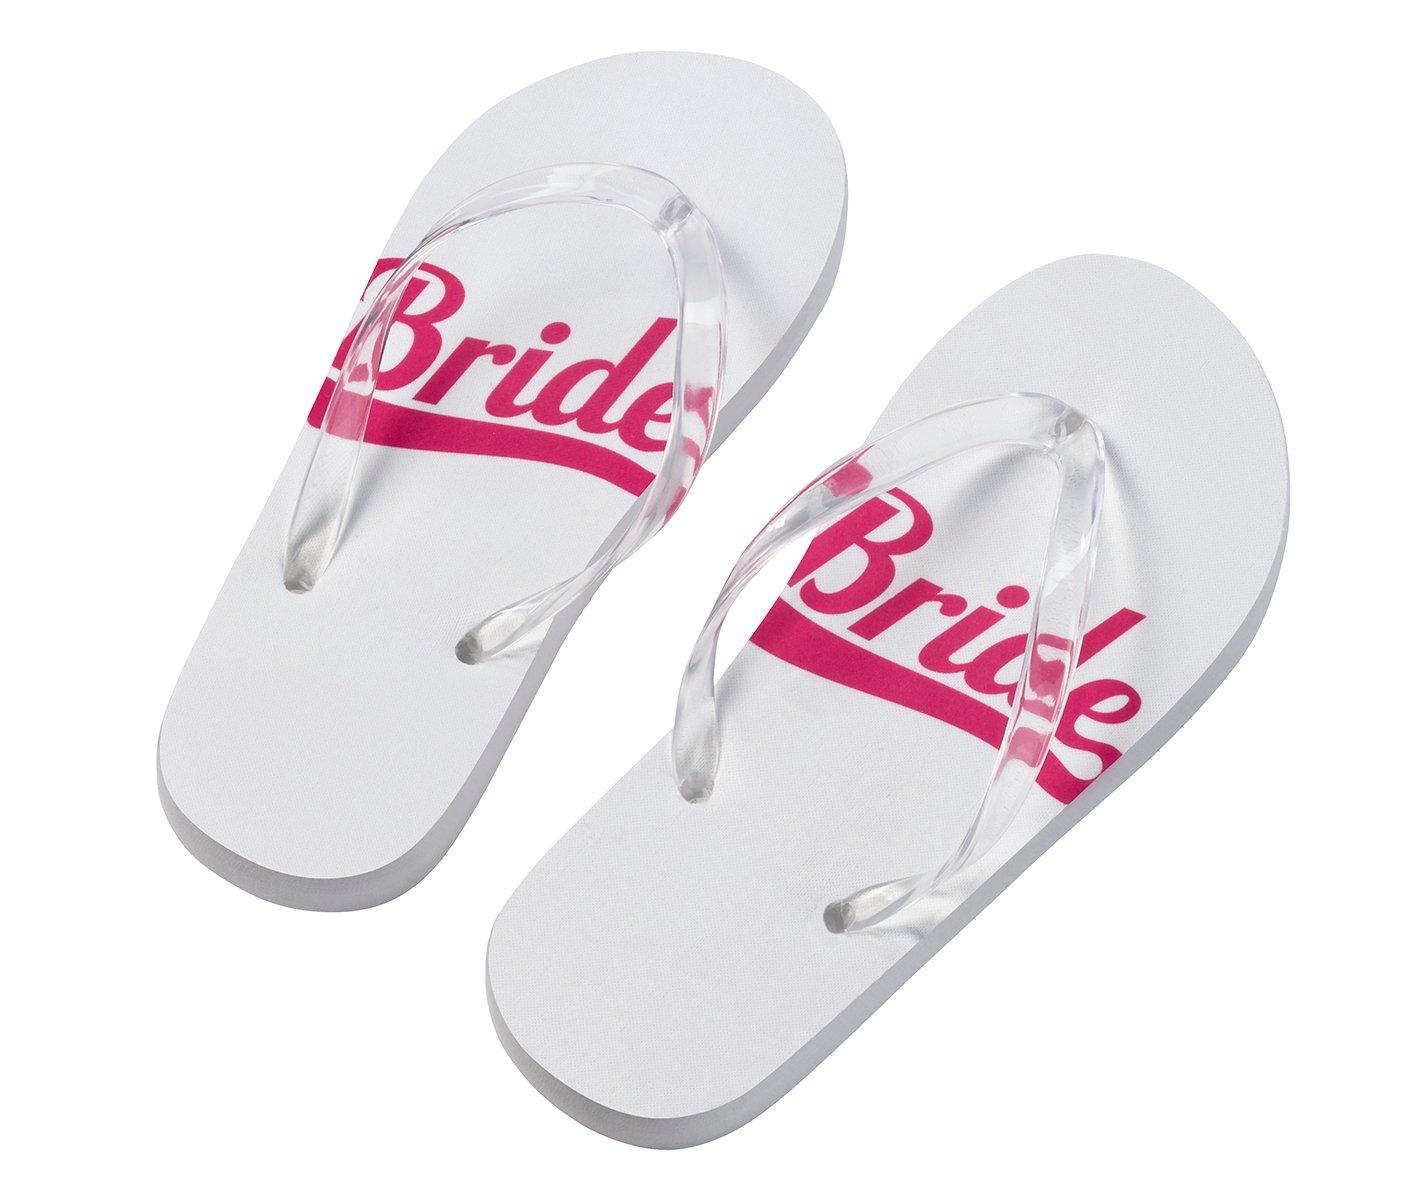 70201a6097b6a7 Amazon.com  Lillian Rose FF672 SB Bride Small 5-6 Wedding Party Flip Flops  Pink White  Home   Kitchen